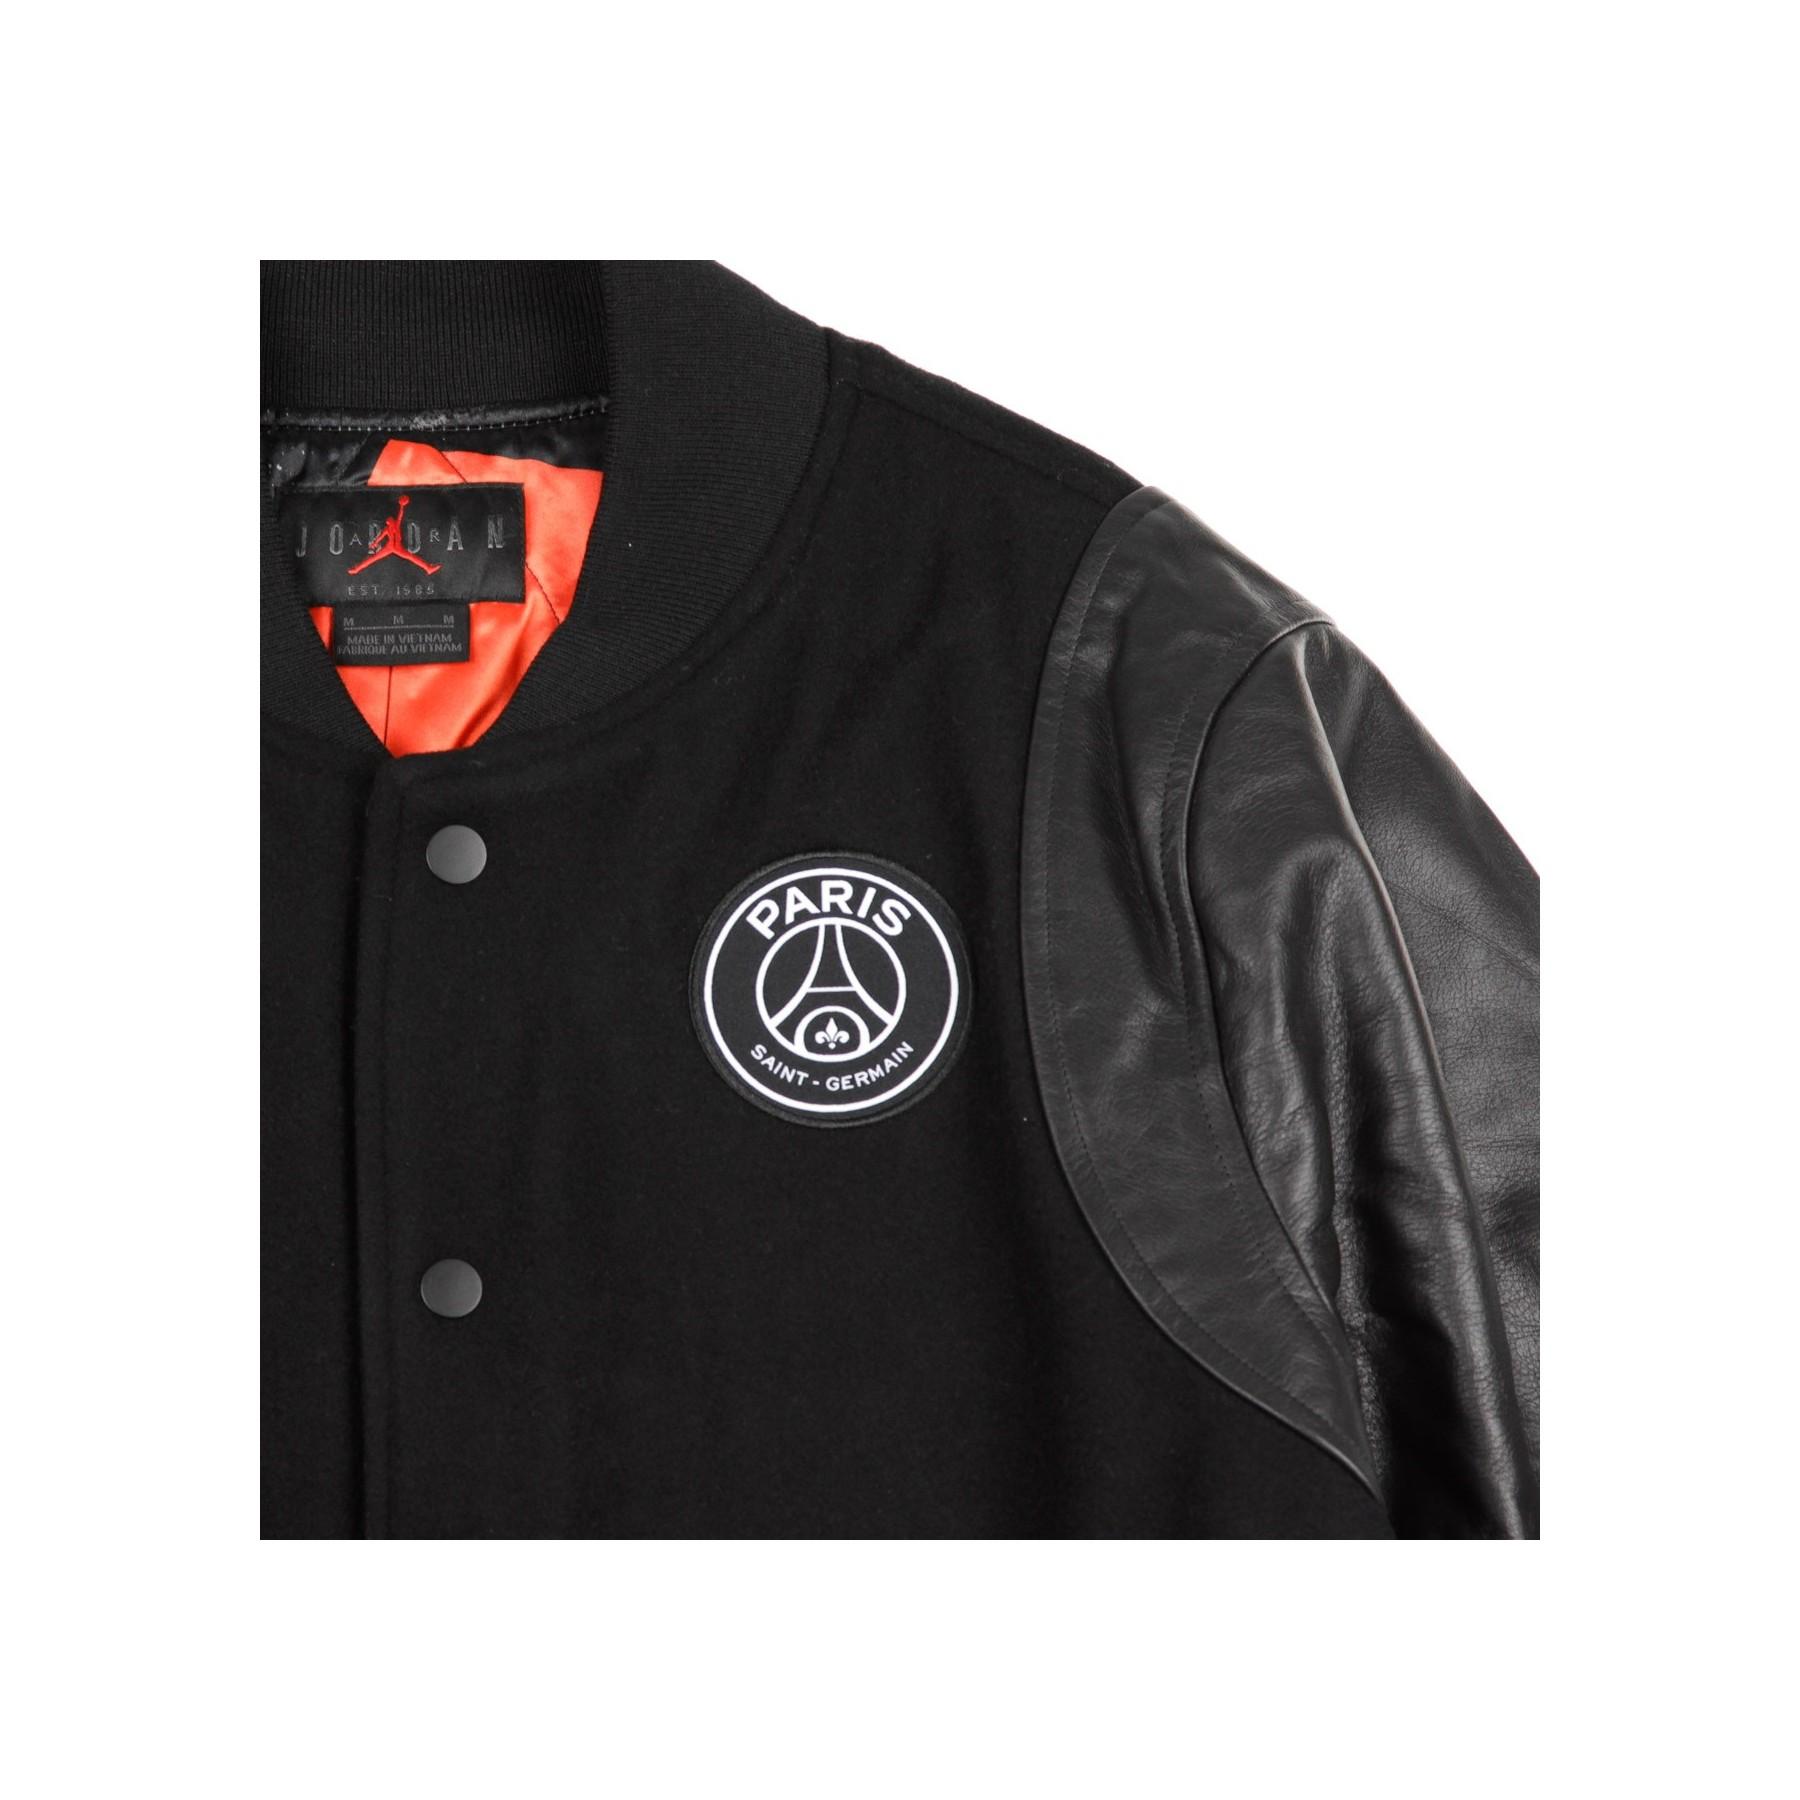 giubbotto college paris saint germain varsity jacket black white